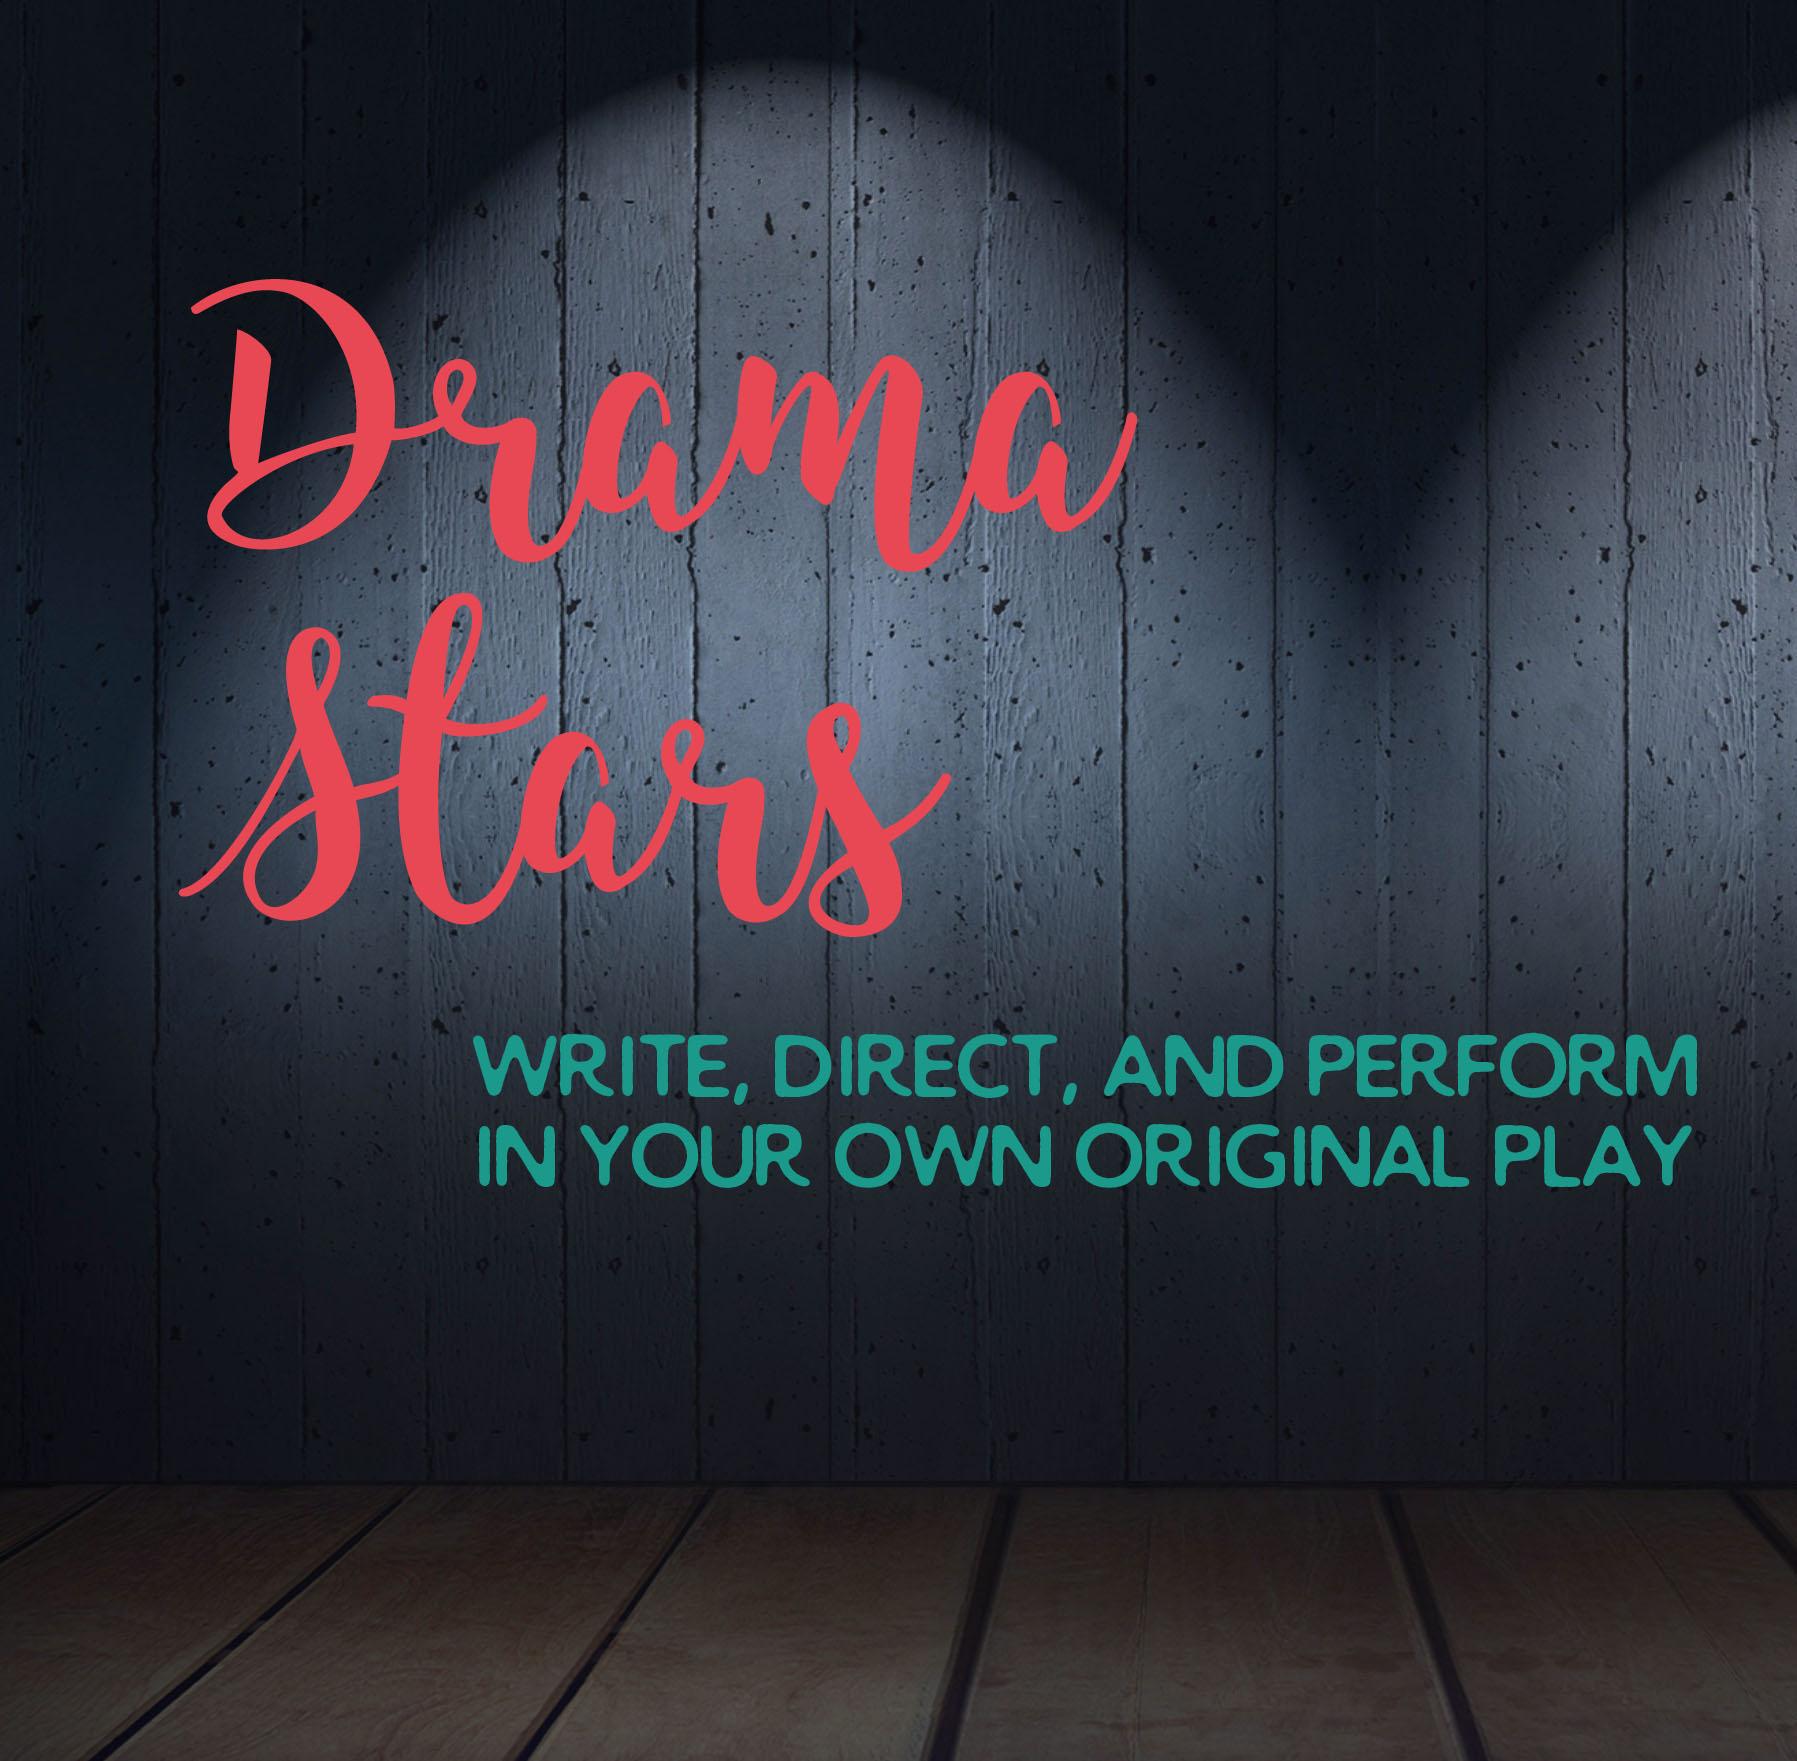 Mini Drama Stars: 1st-3rd Grade: Aug 7 -18 from 9 am – 12:30 pm